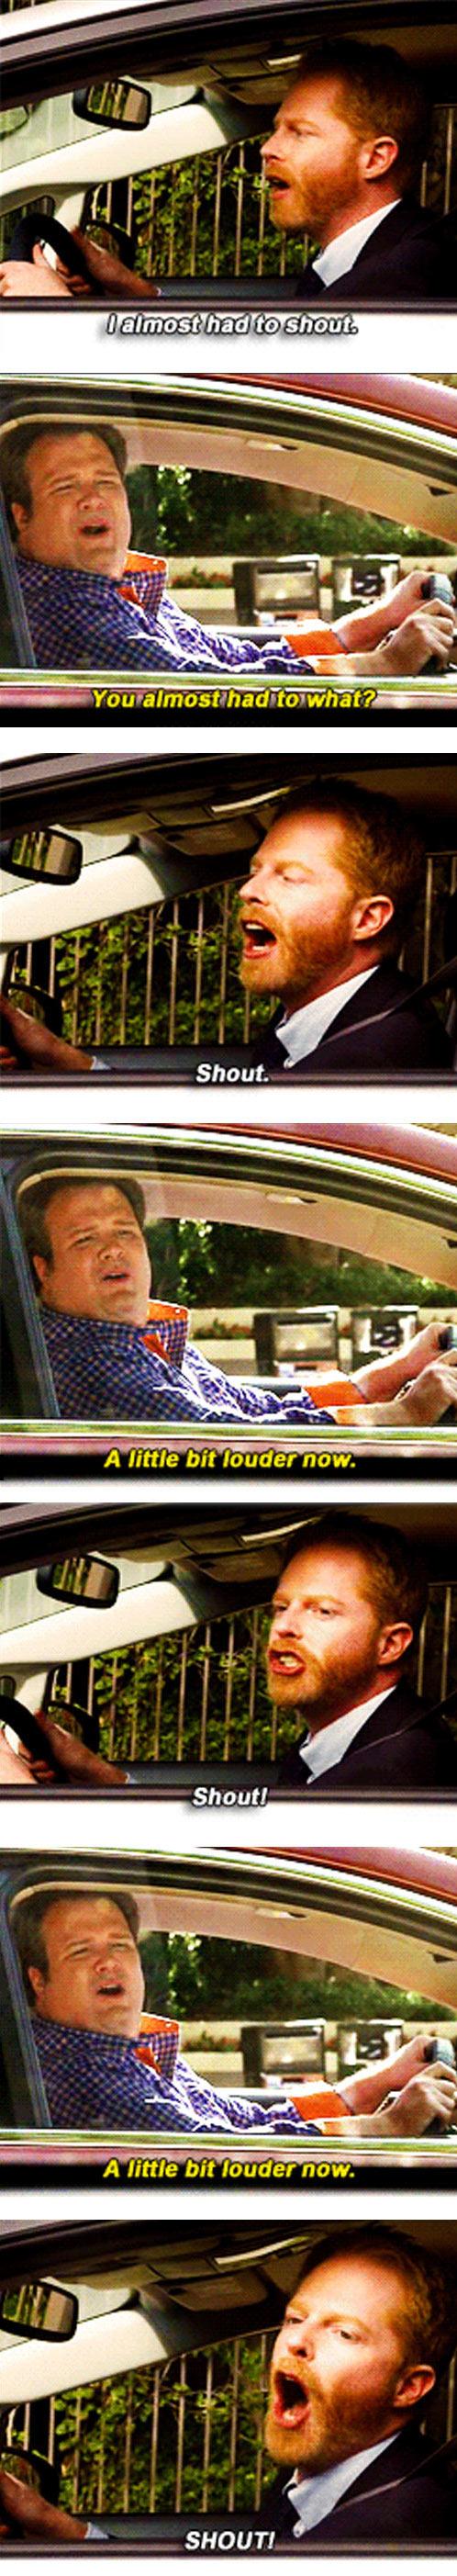 funny-Modern-Family-conversation-car